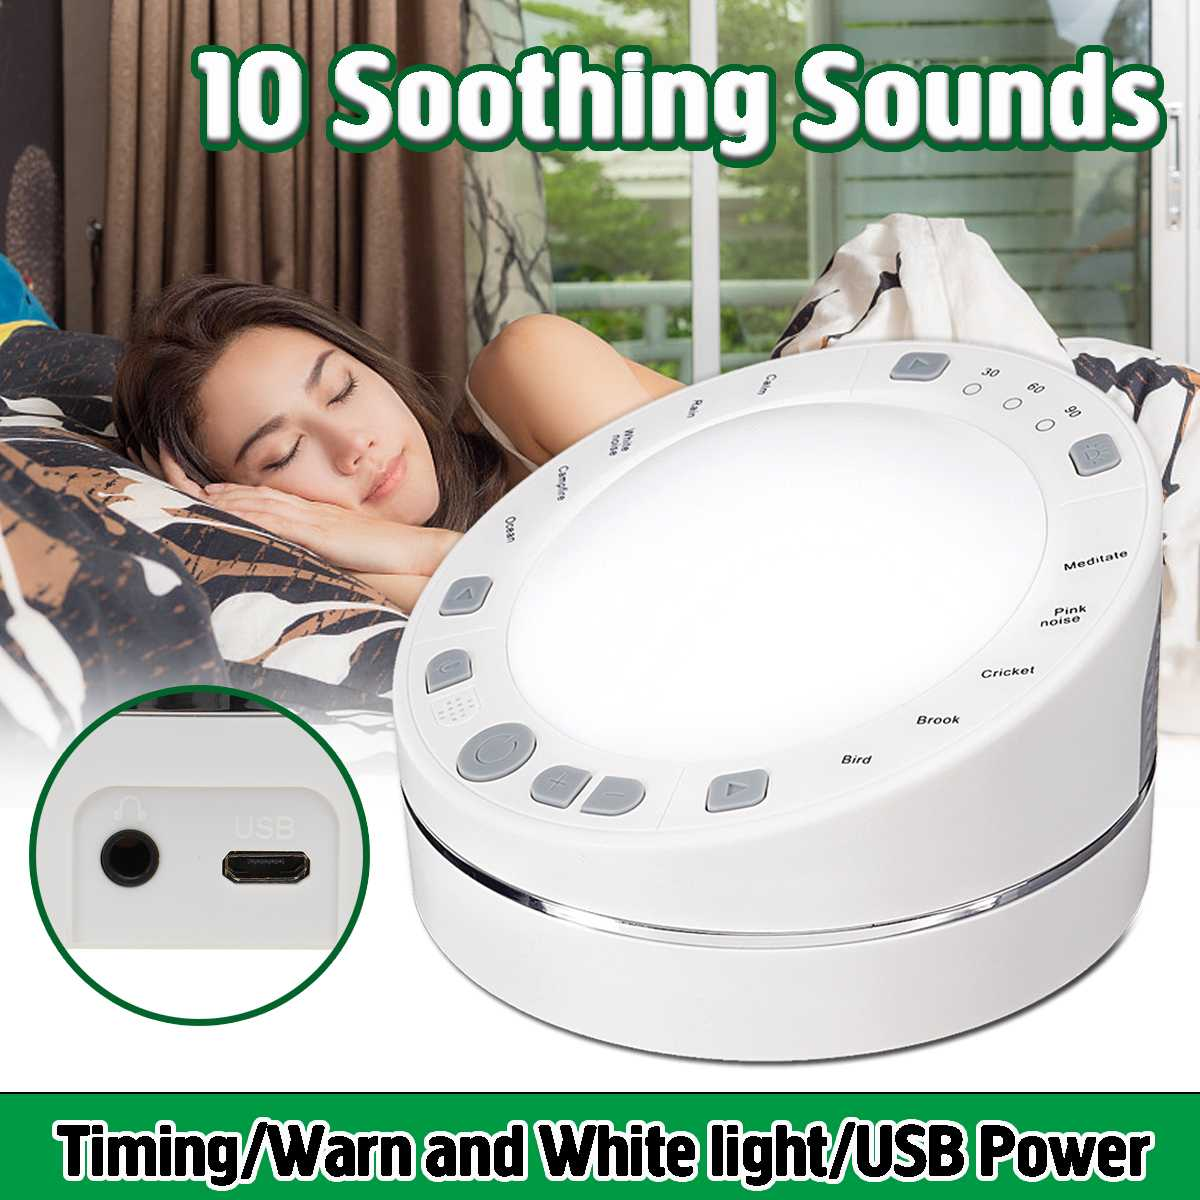 Sleep Sound Therapy Sound Machine Night Light USB Battery Powered Noise Machine  For Sleeping Relaxation Sleep Instrument